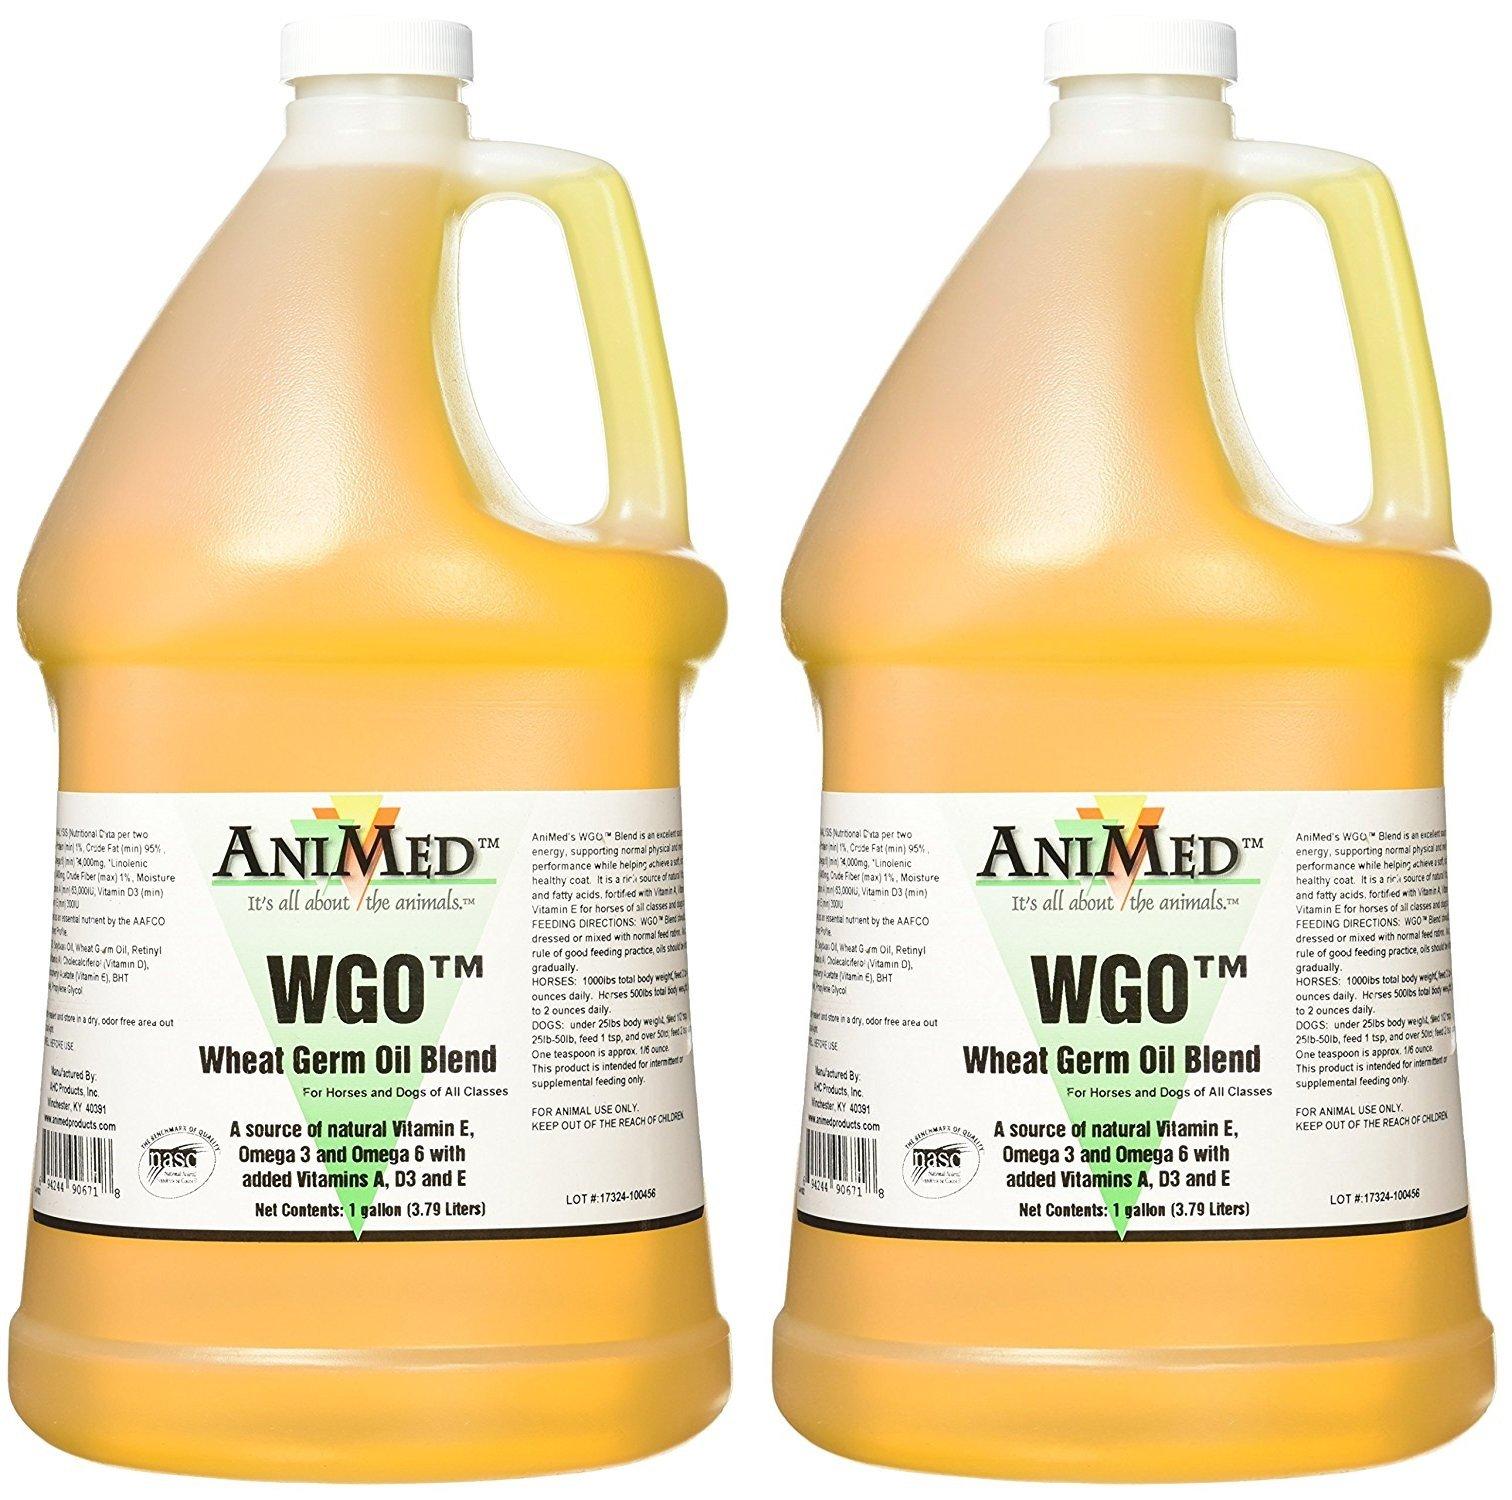 AniMed WGO Wheat Germ Oil Blend Supplement, 1 Gallon (2 Pack)